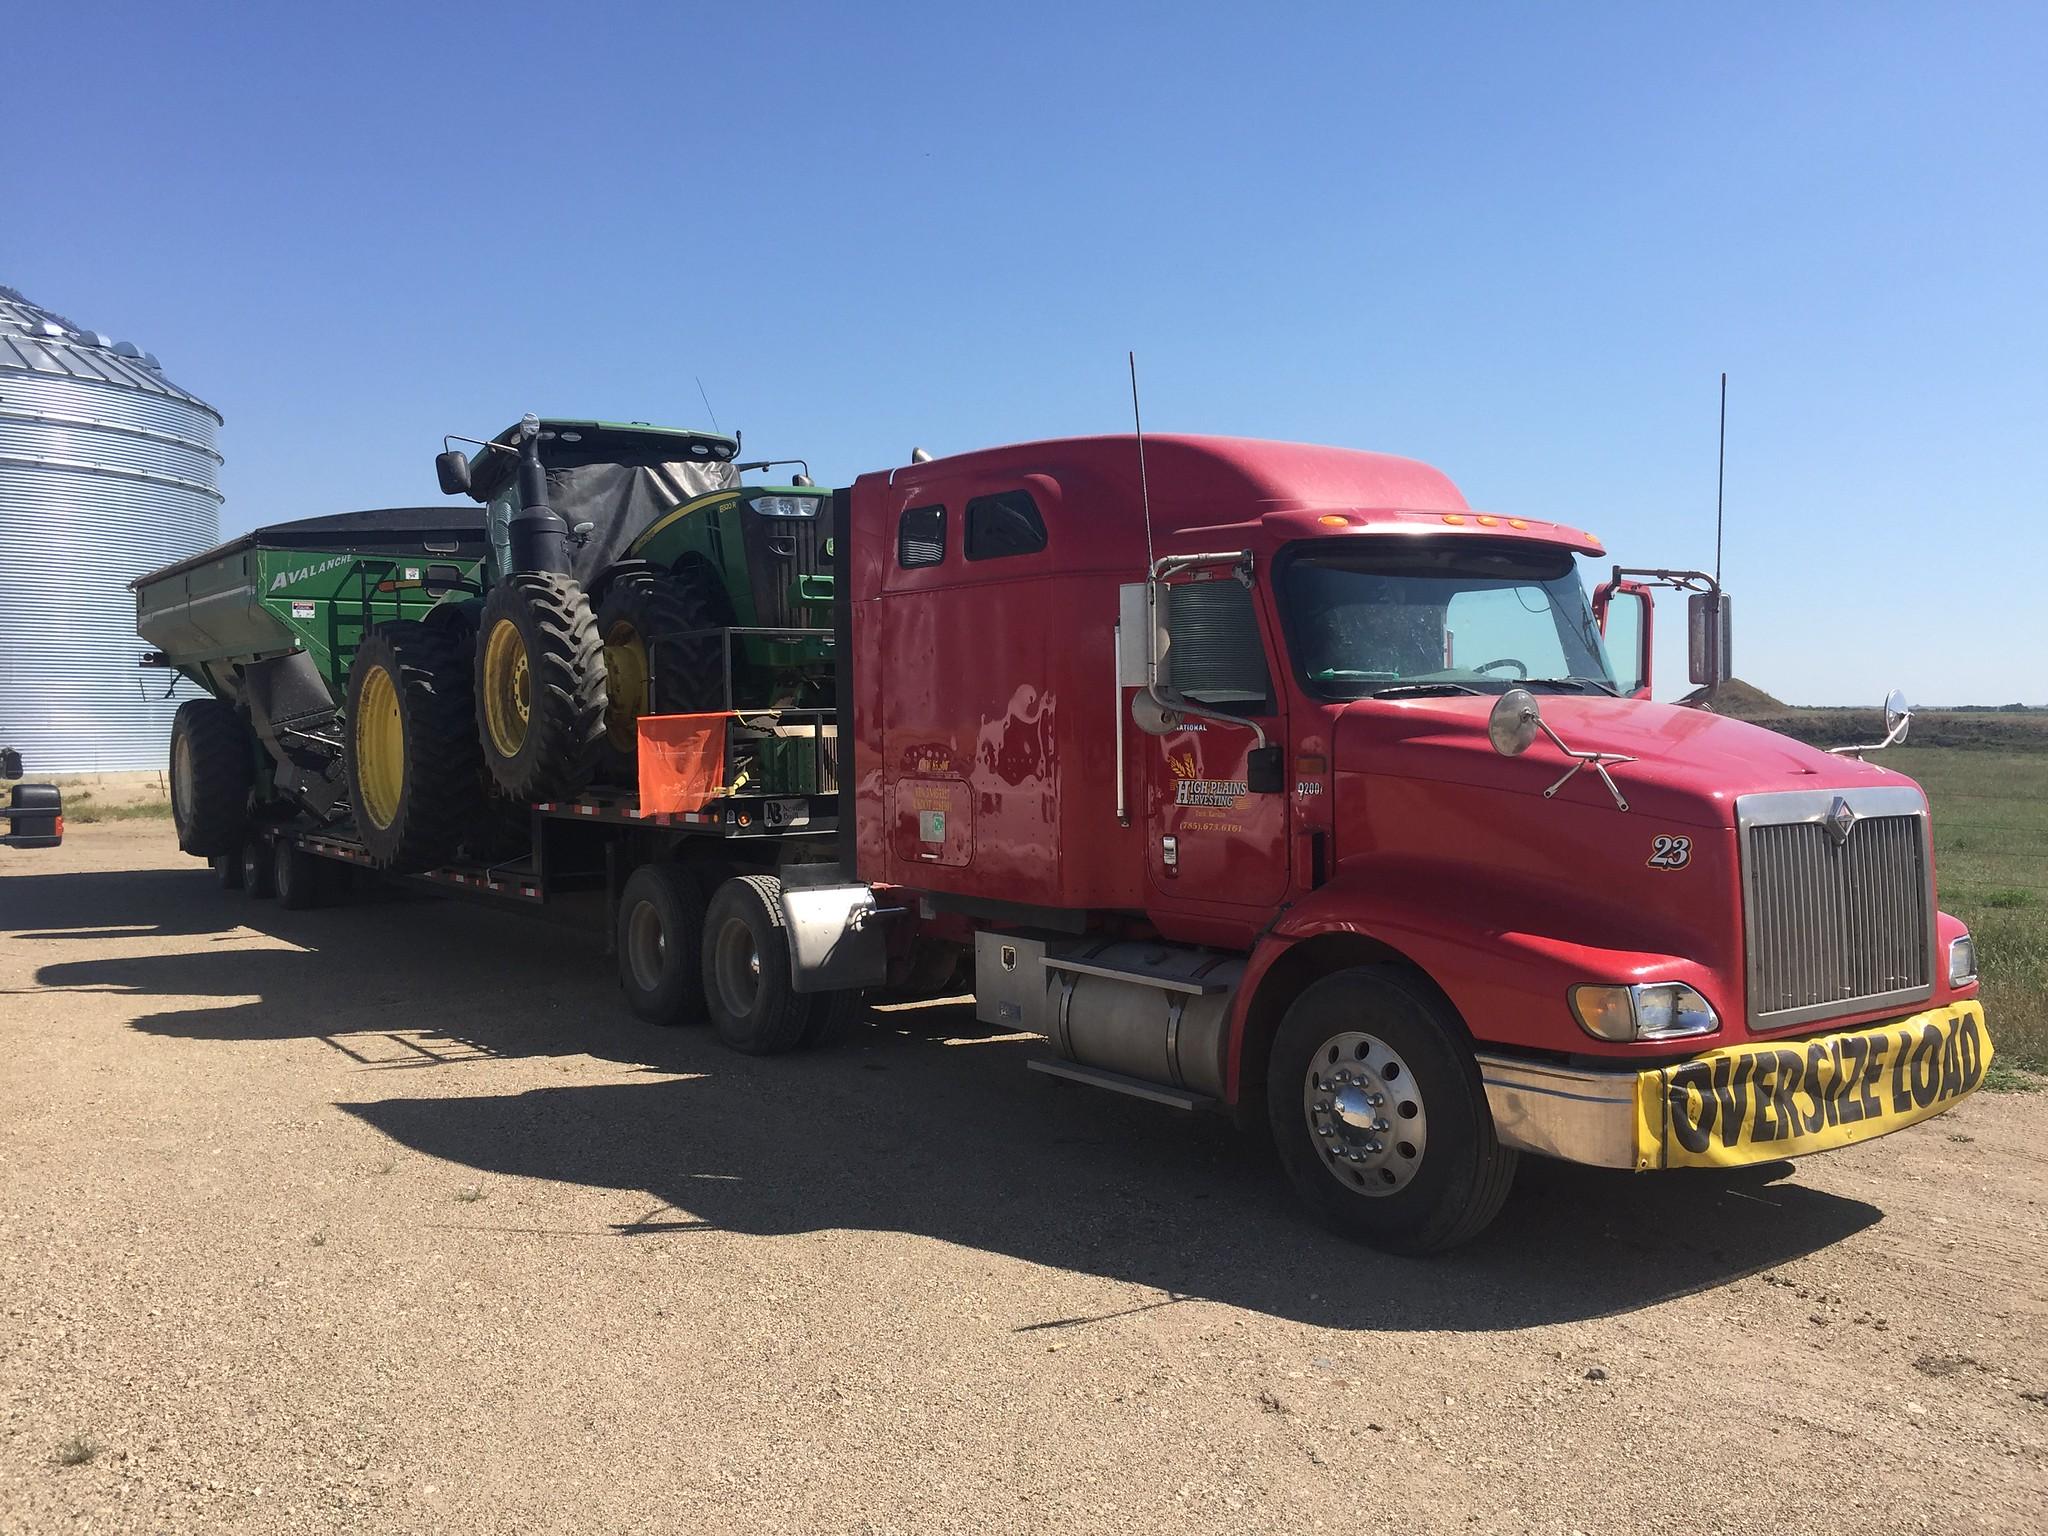 High Plains Harvesting - Photo from Ryan